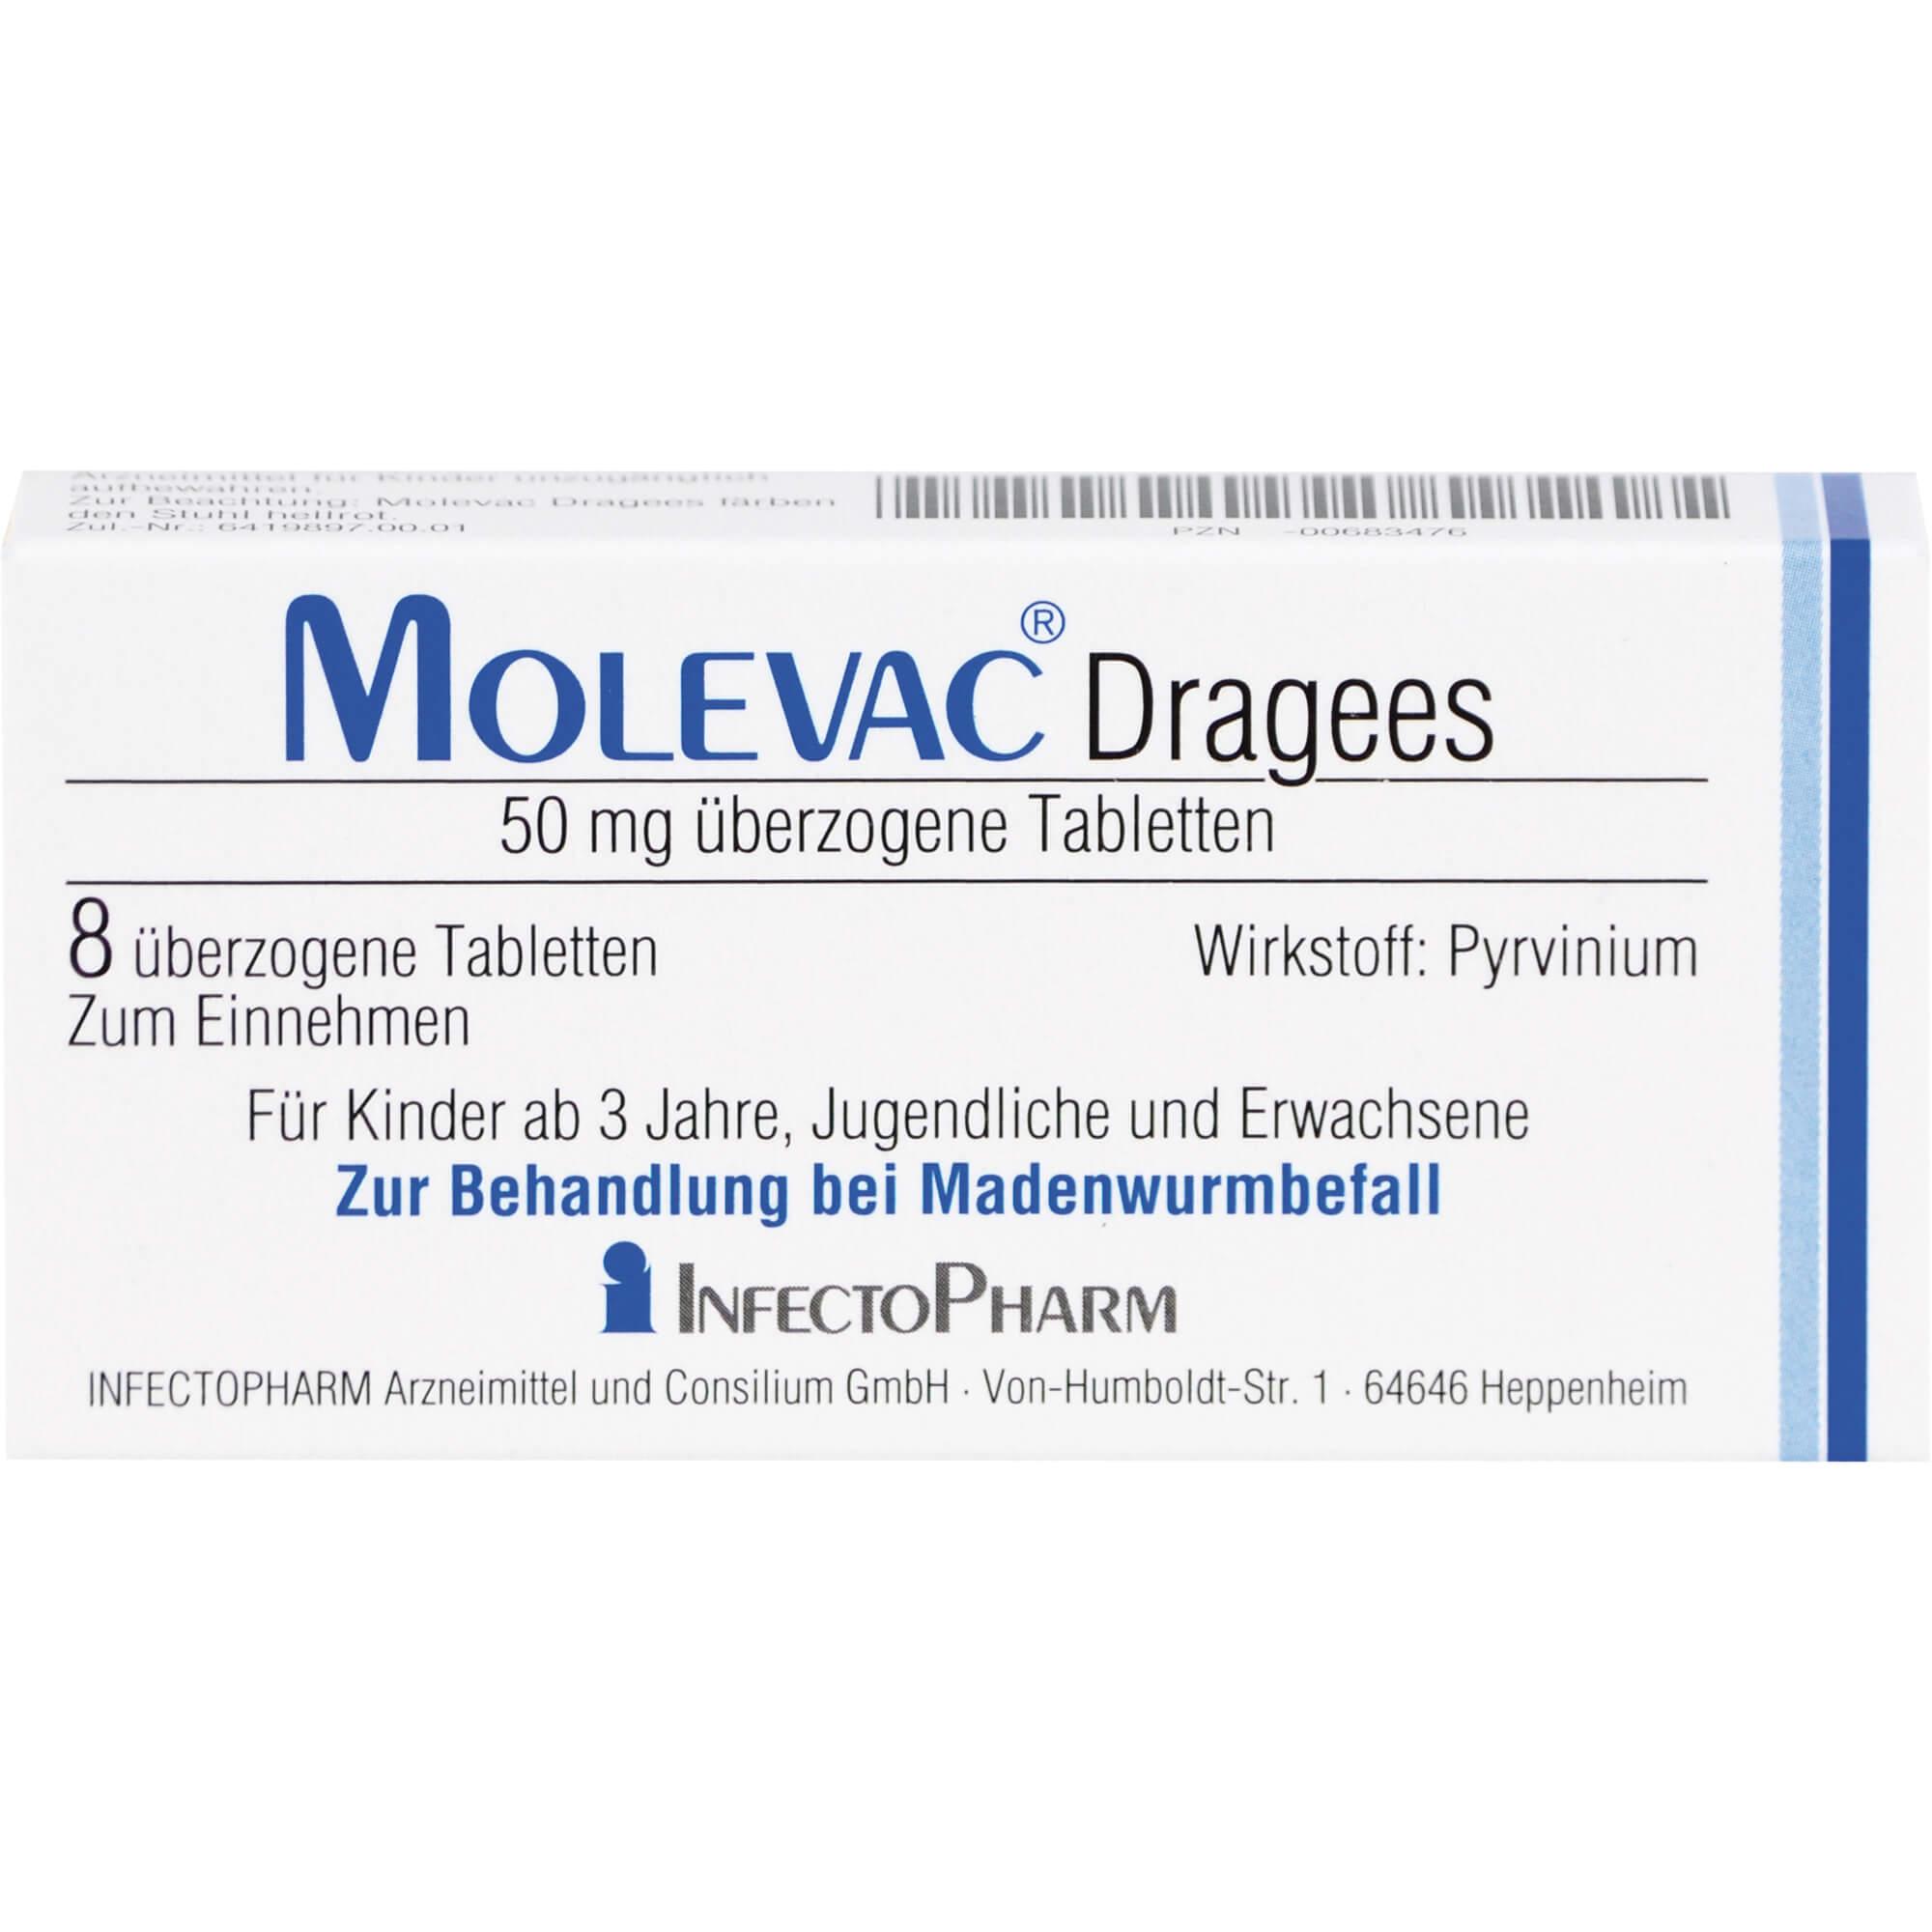 MOLEVAC Dragees